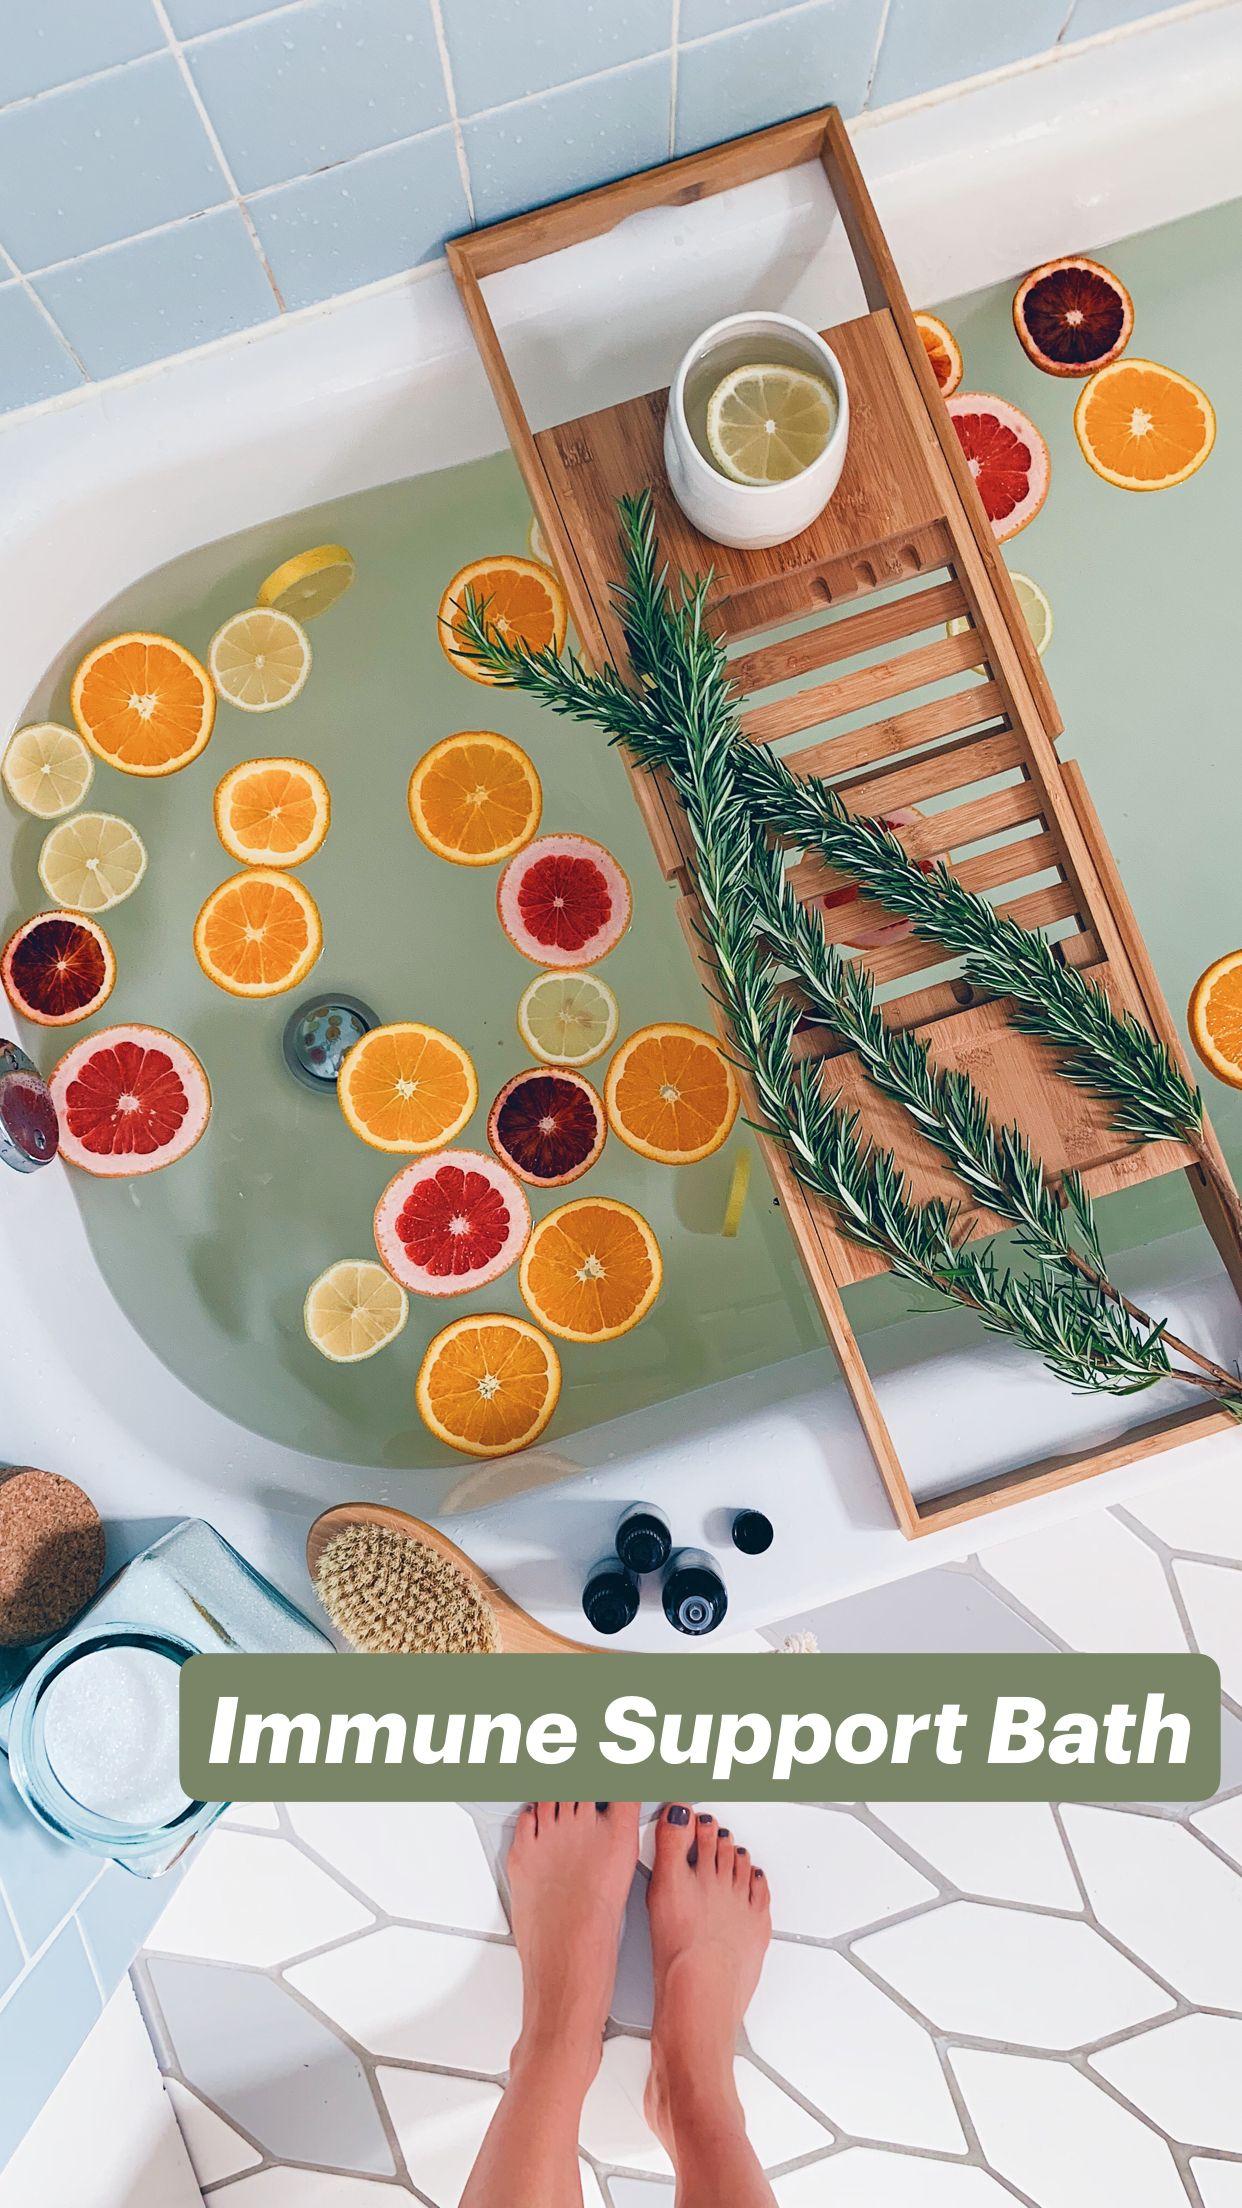 Immune Support Bath